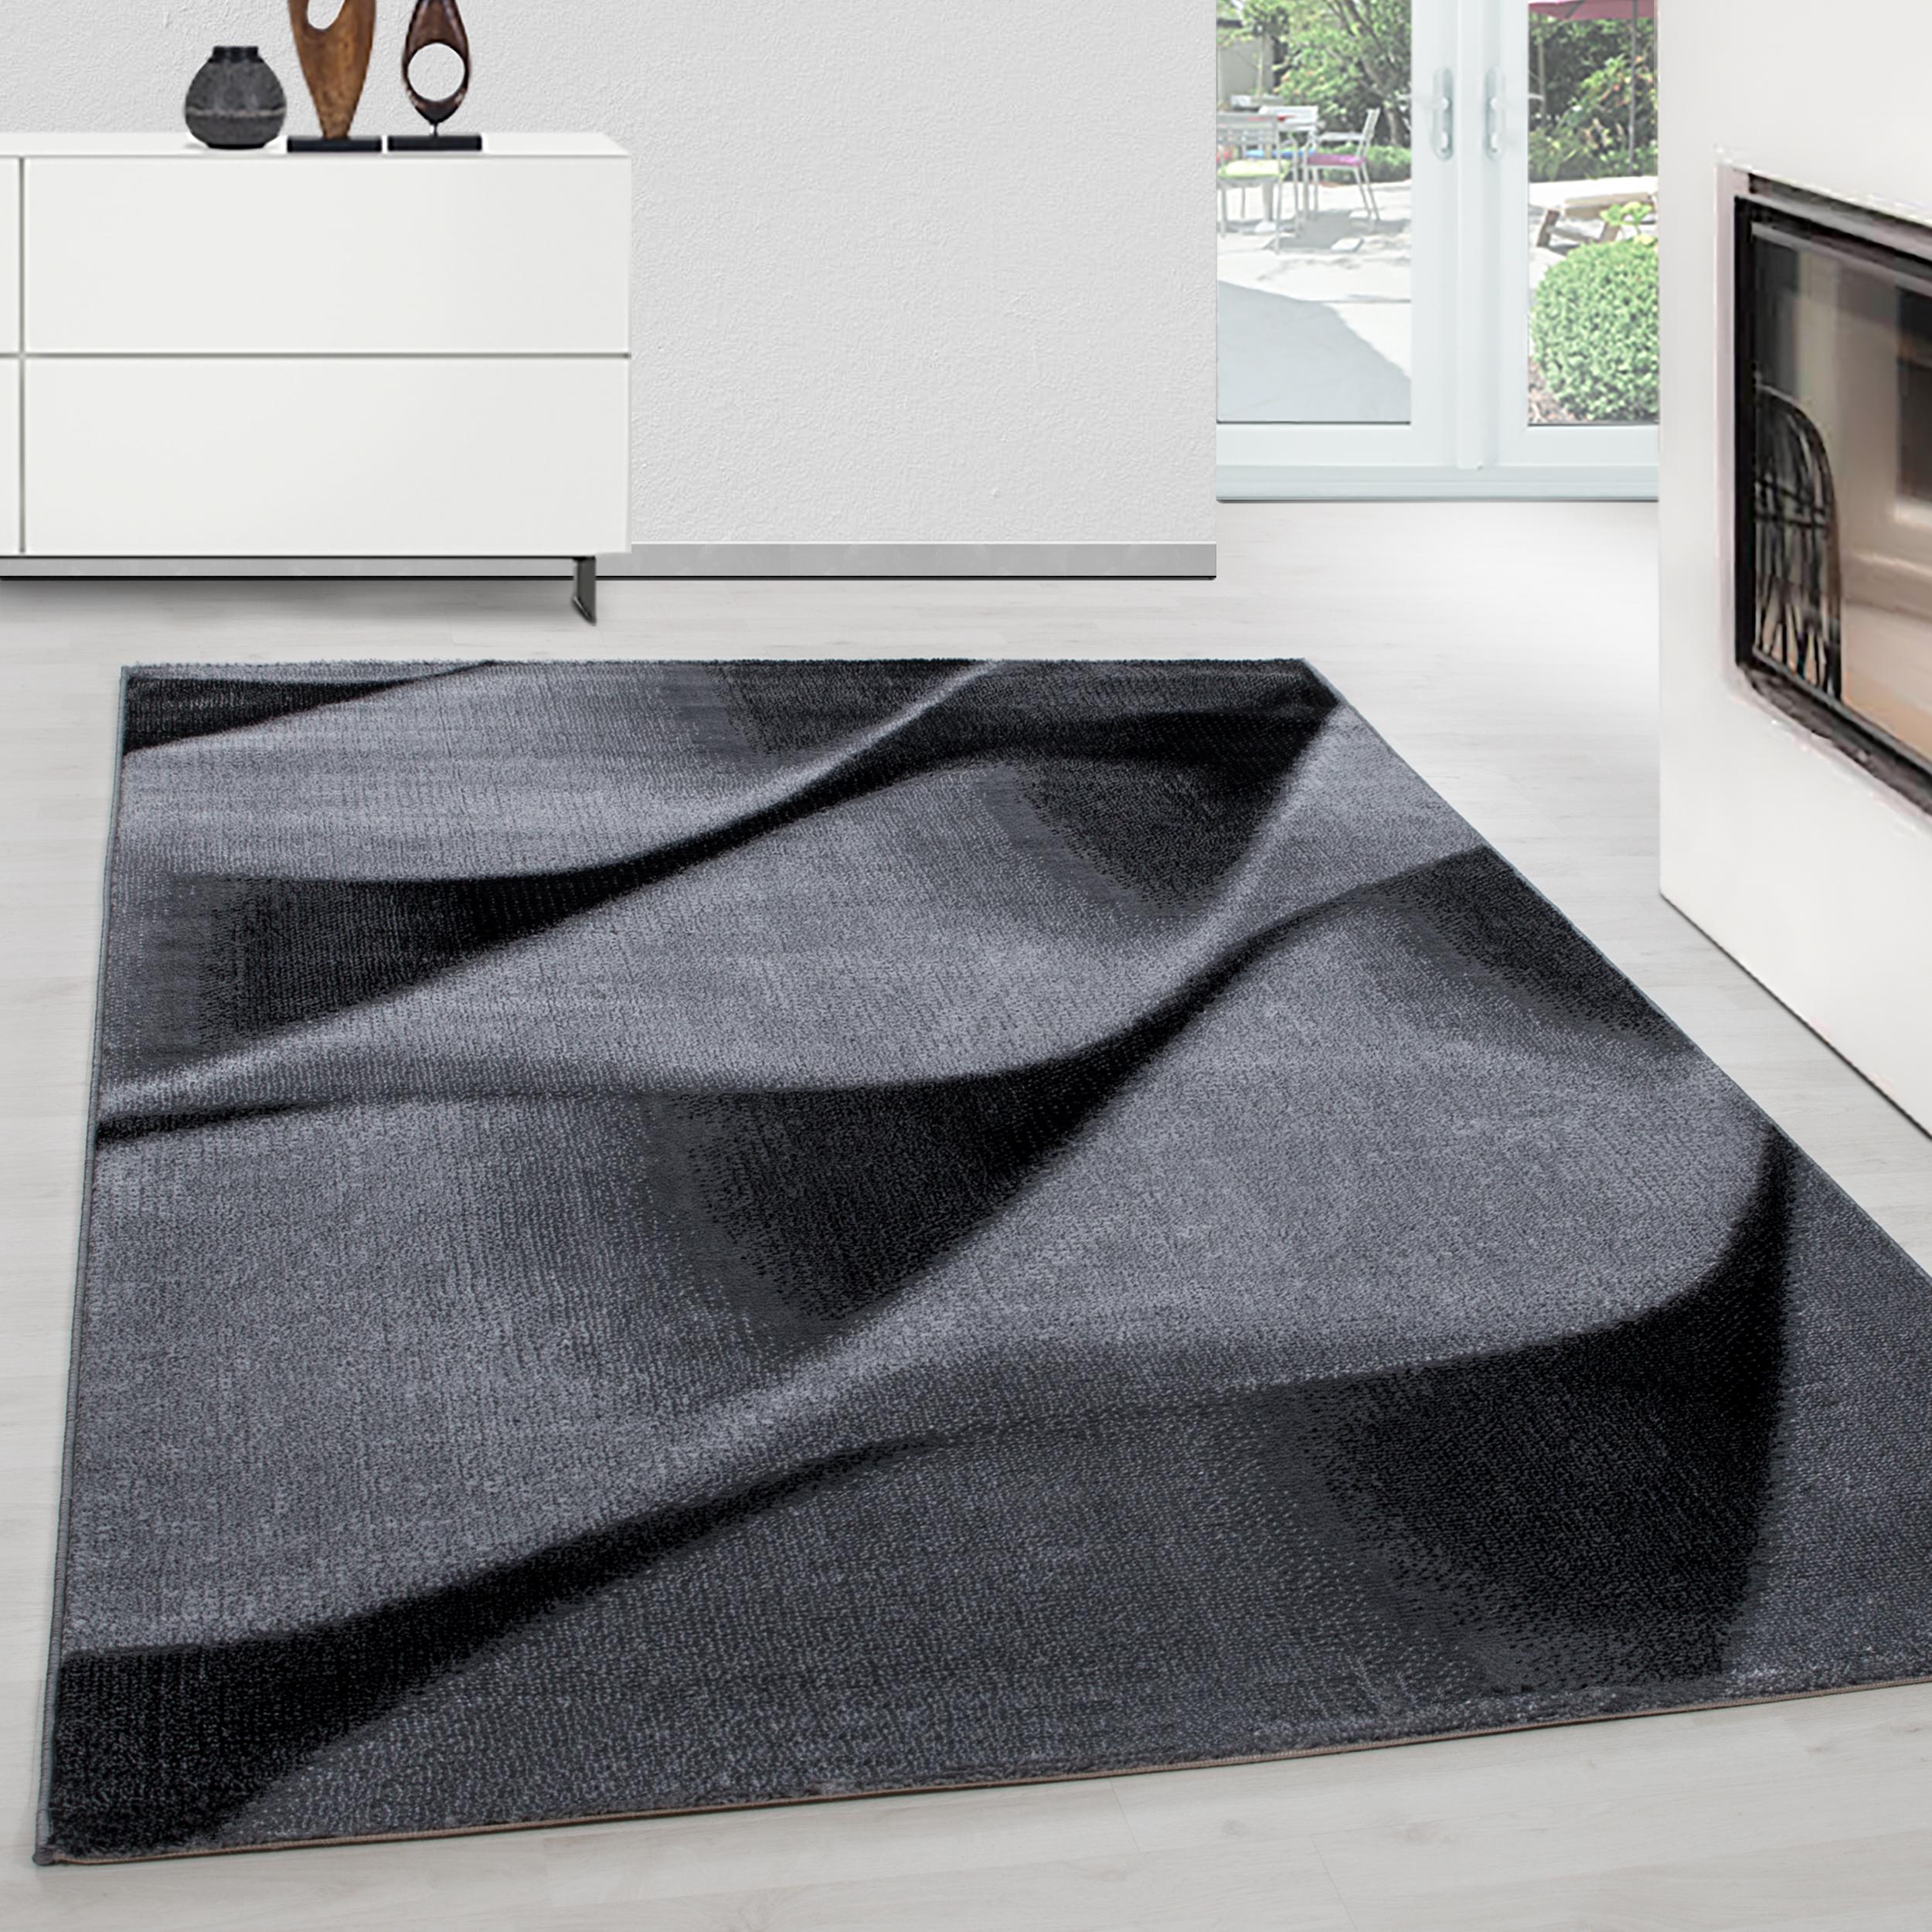 Teppium Modern Design Rugs Short Pile